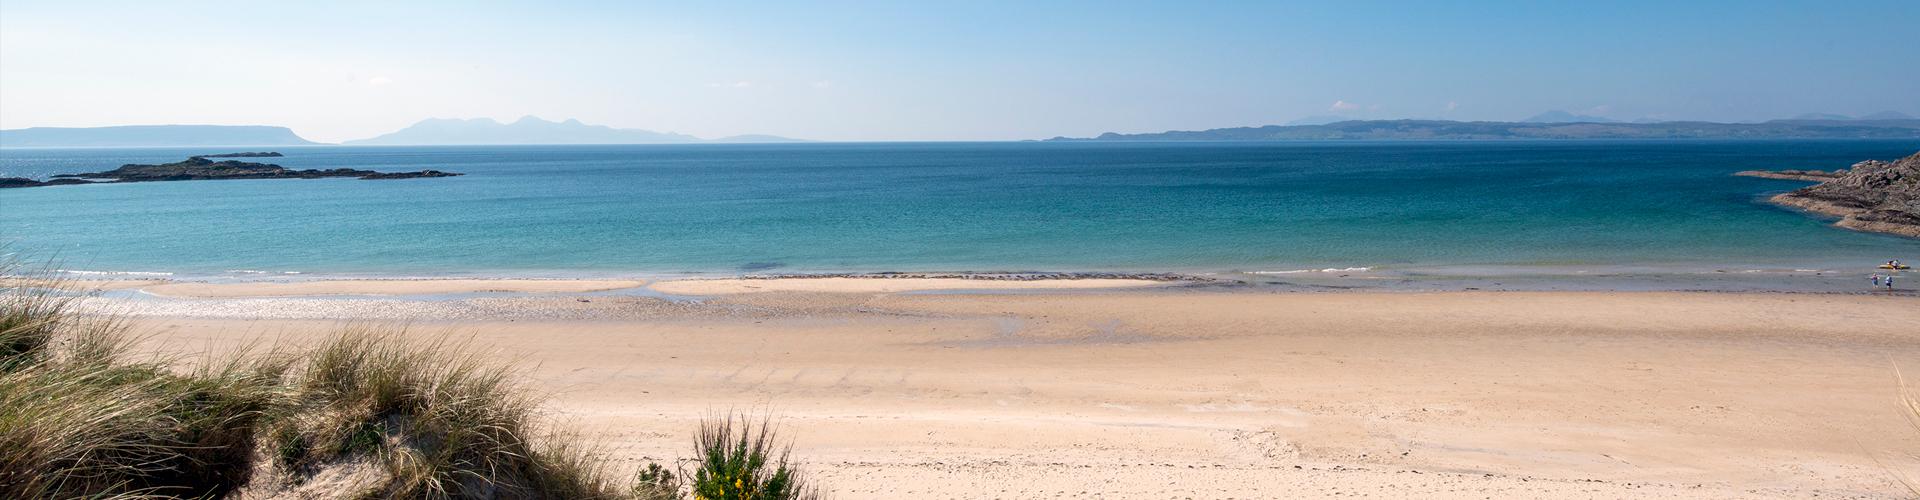 Camusdarach beach looking across the sea to Skye, Eigg and Rum